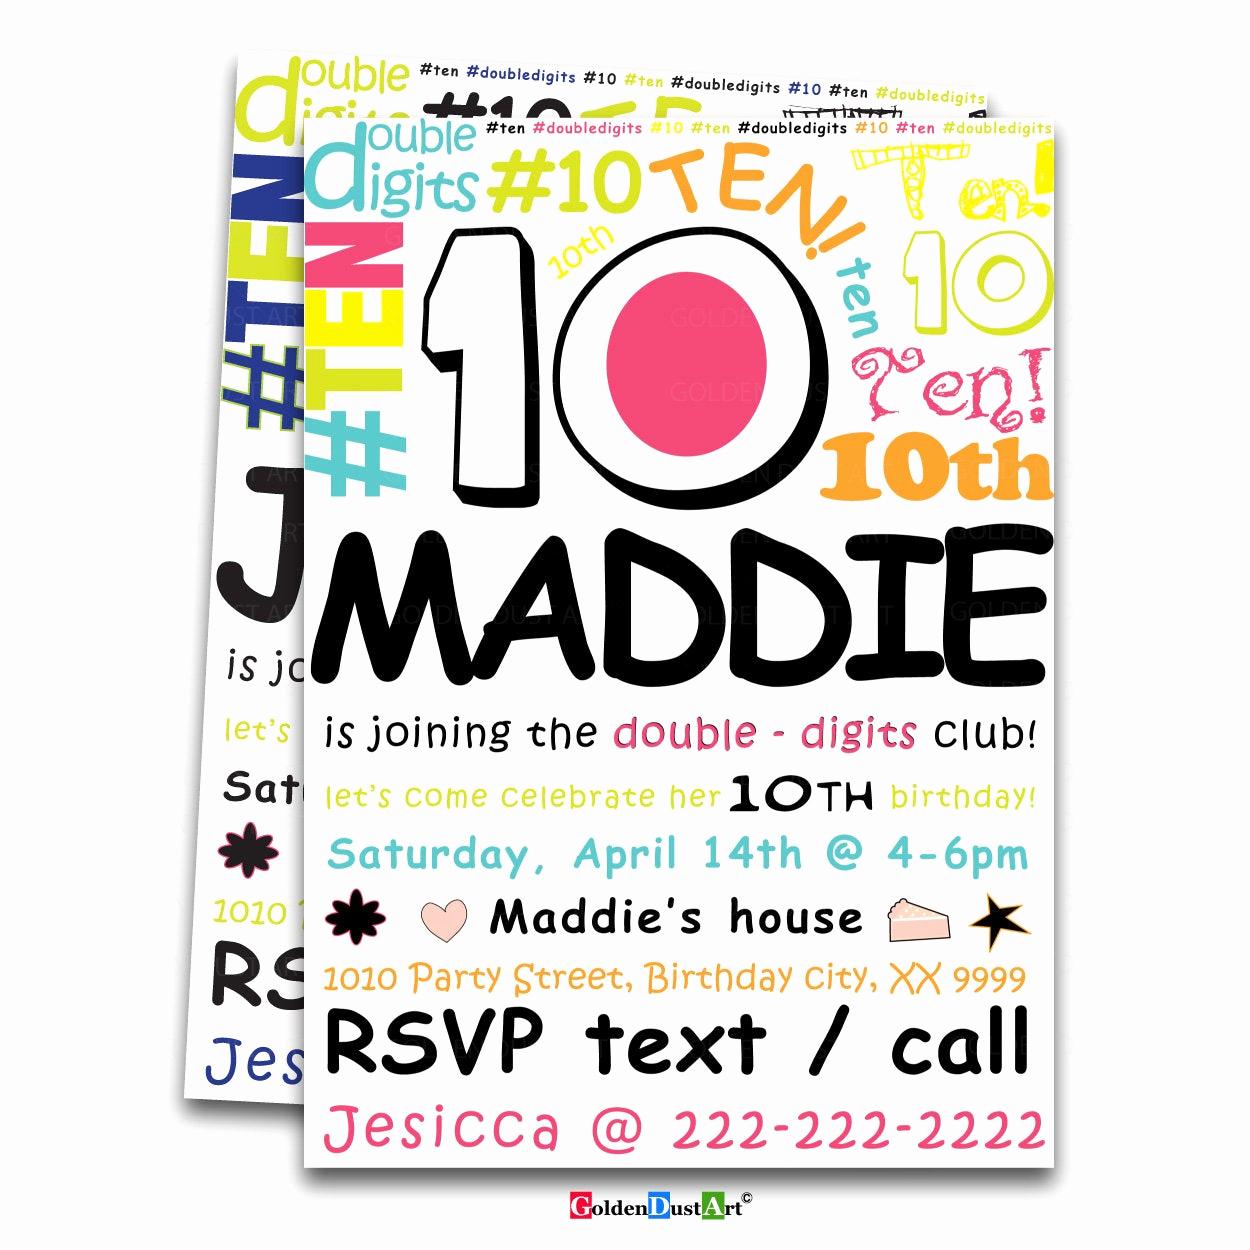 10th Birthday Invitation Wording Fresh Double Digits Birthday Party Invitation 10th Birthday